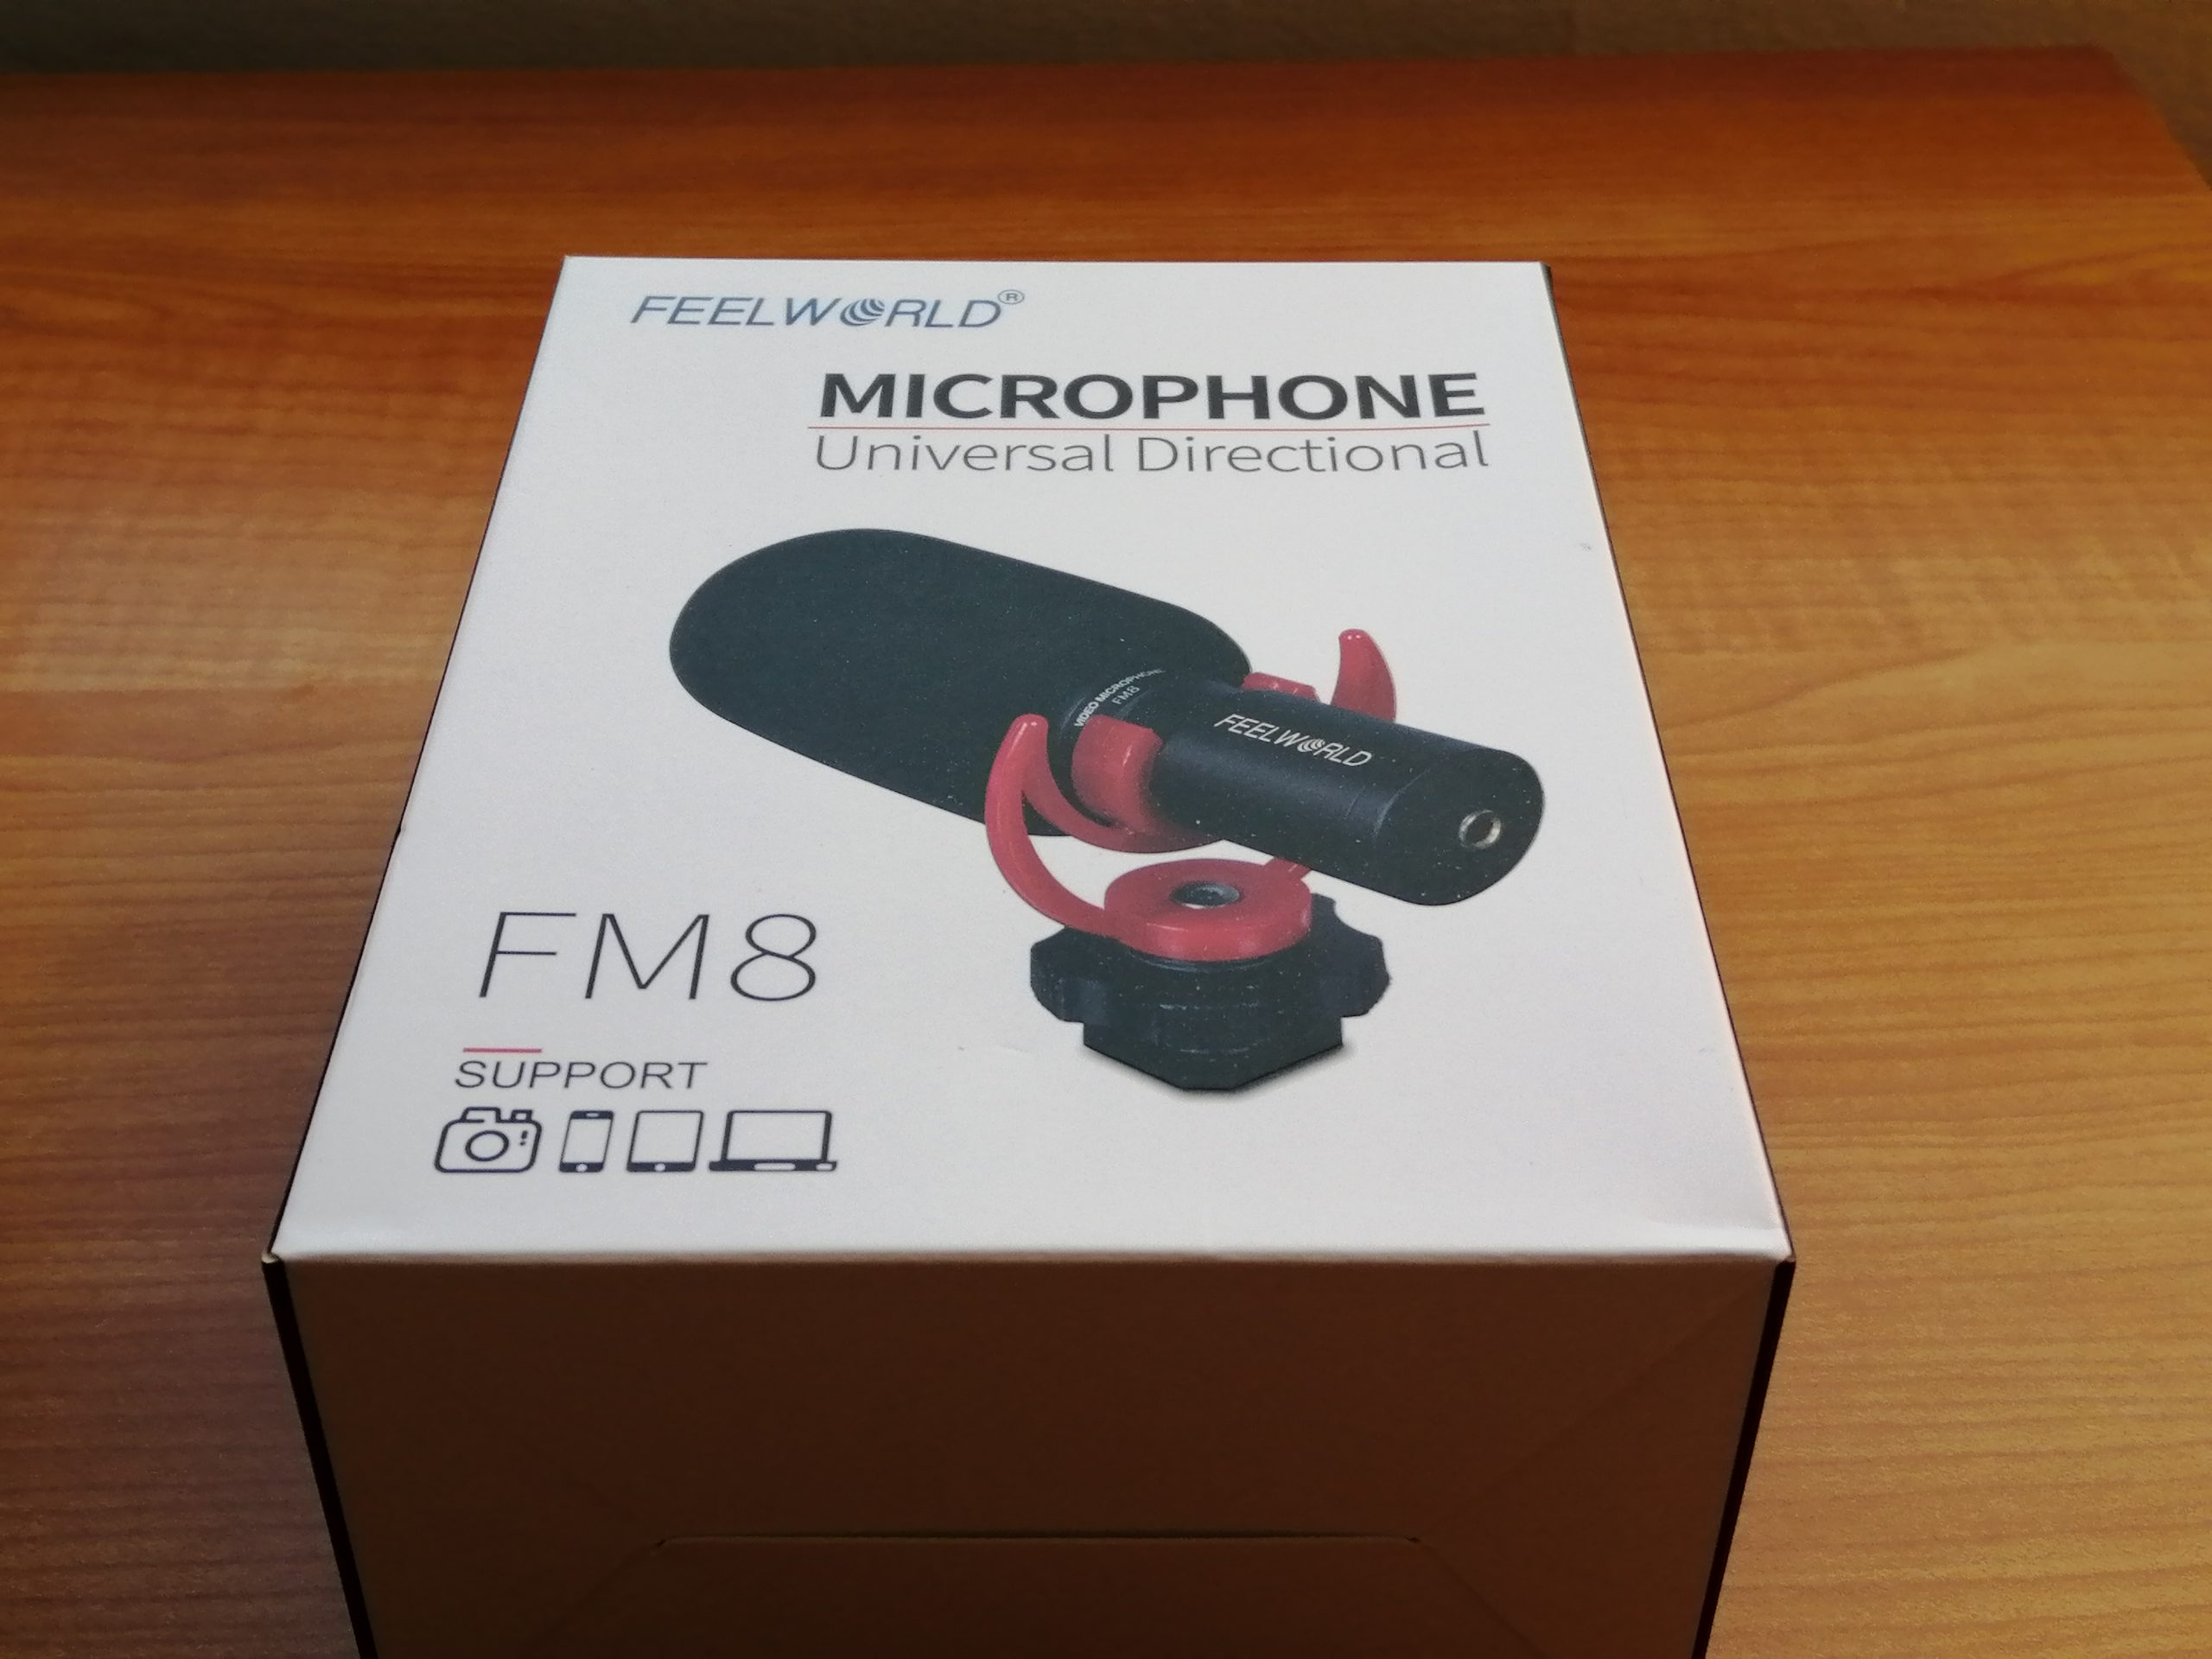 Caja FM8 micrófono Feelworld